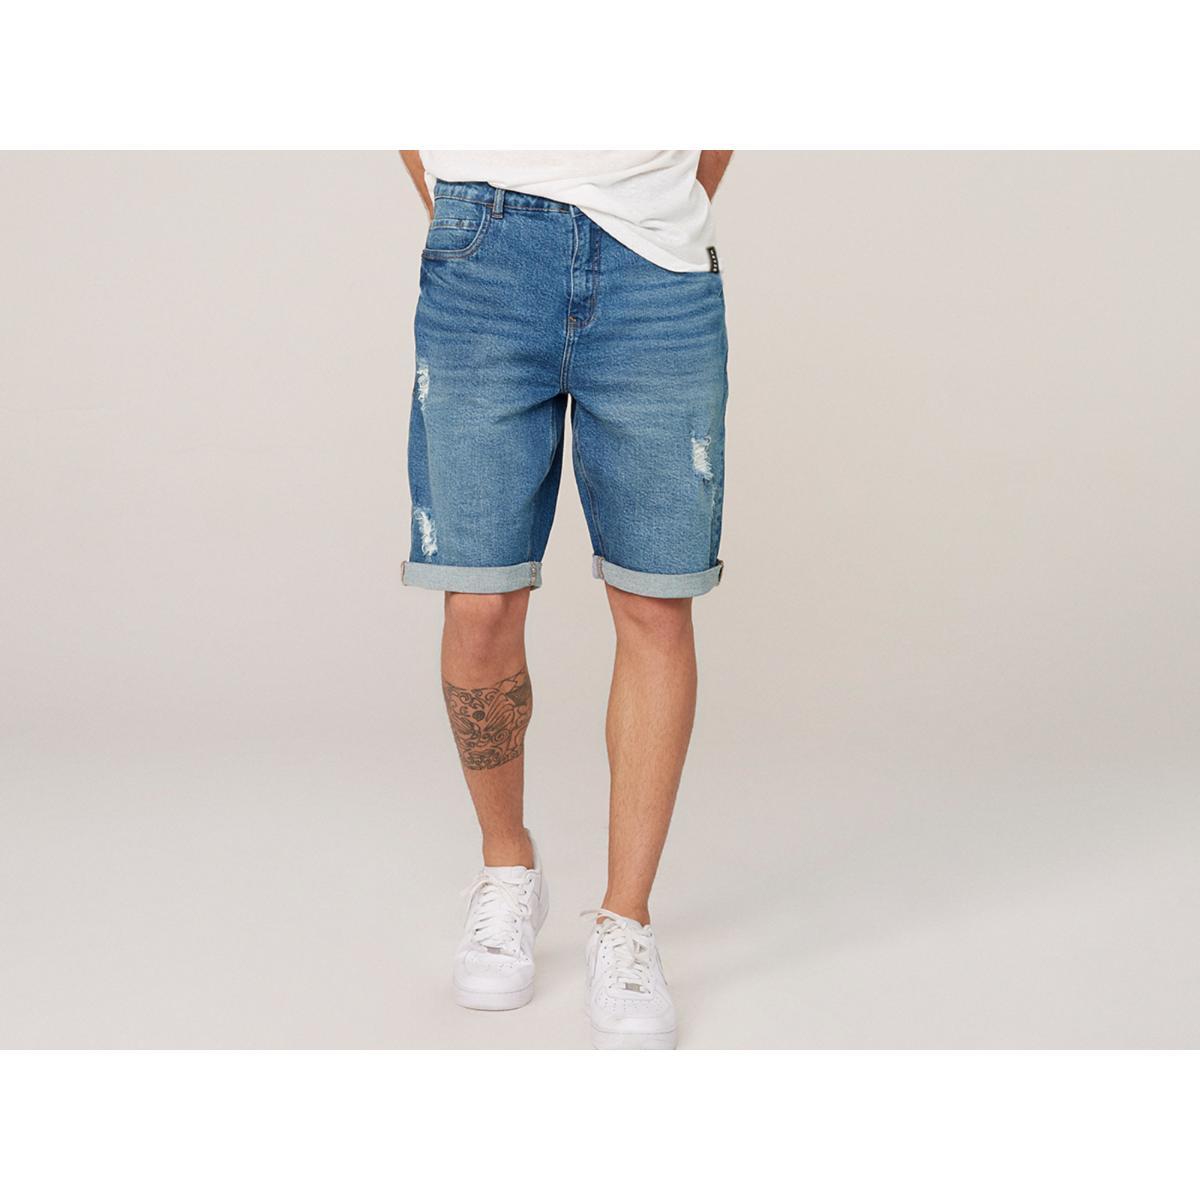 Bermuda Masculina Dzarm Zc4v 1dsn  Jeans